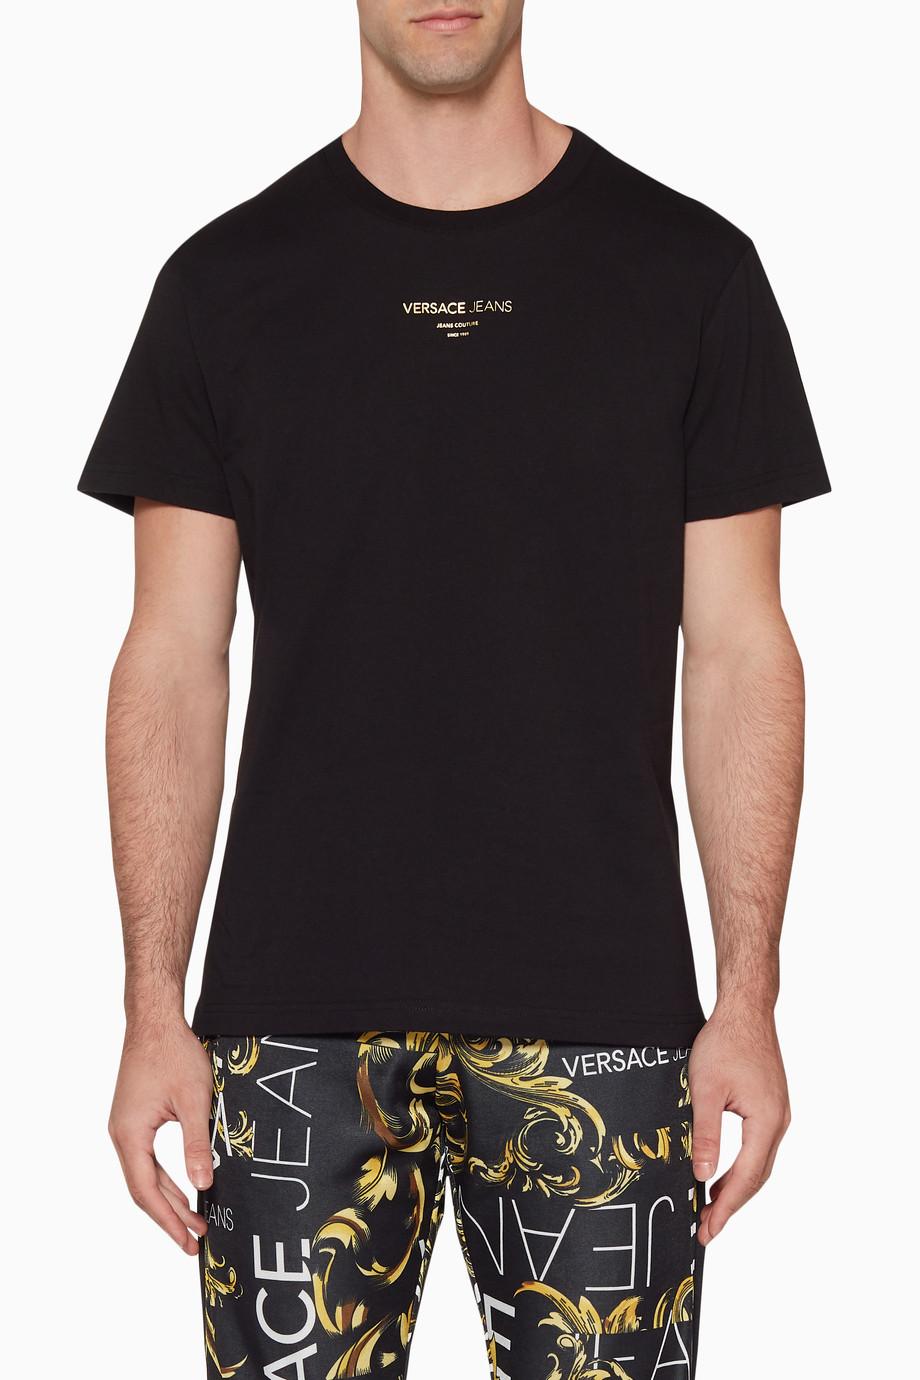 a8fc8444 Versace Jeans Tiger Foil Logo T Shirt - raveitsafe